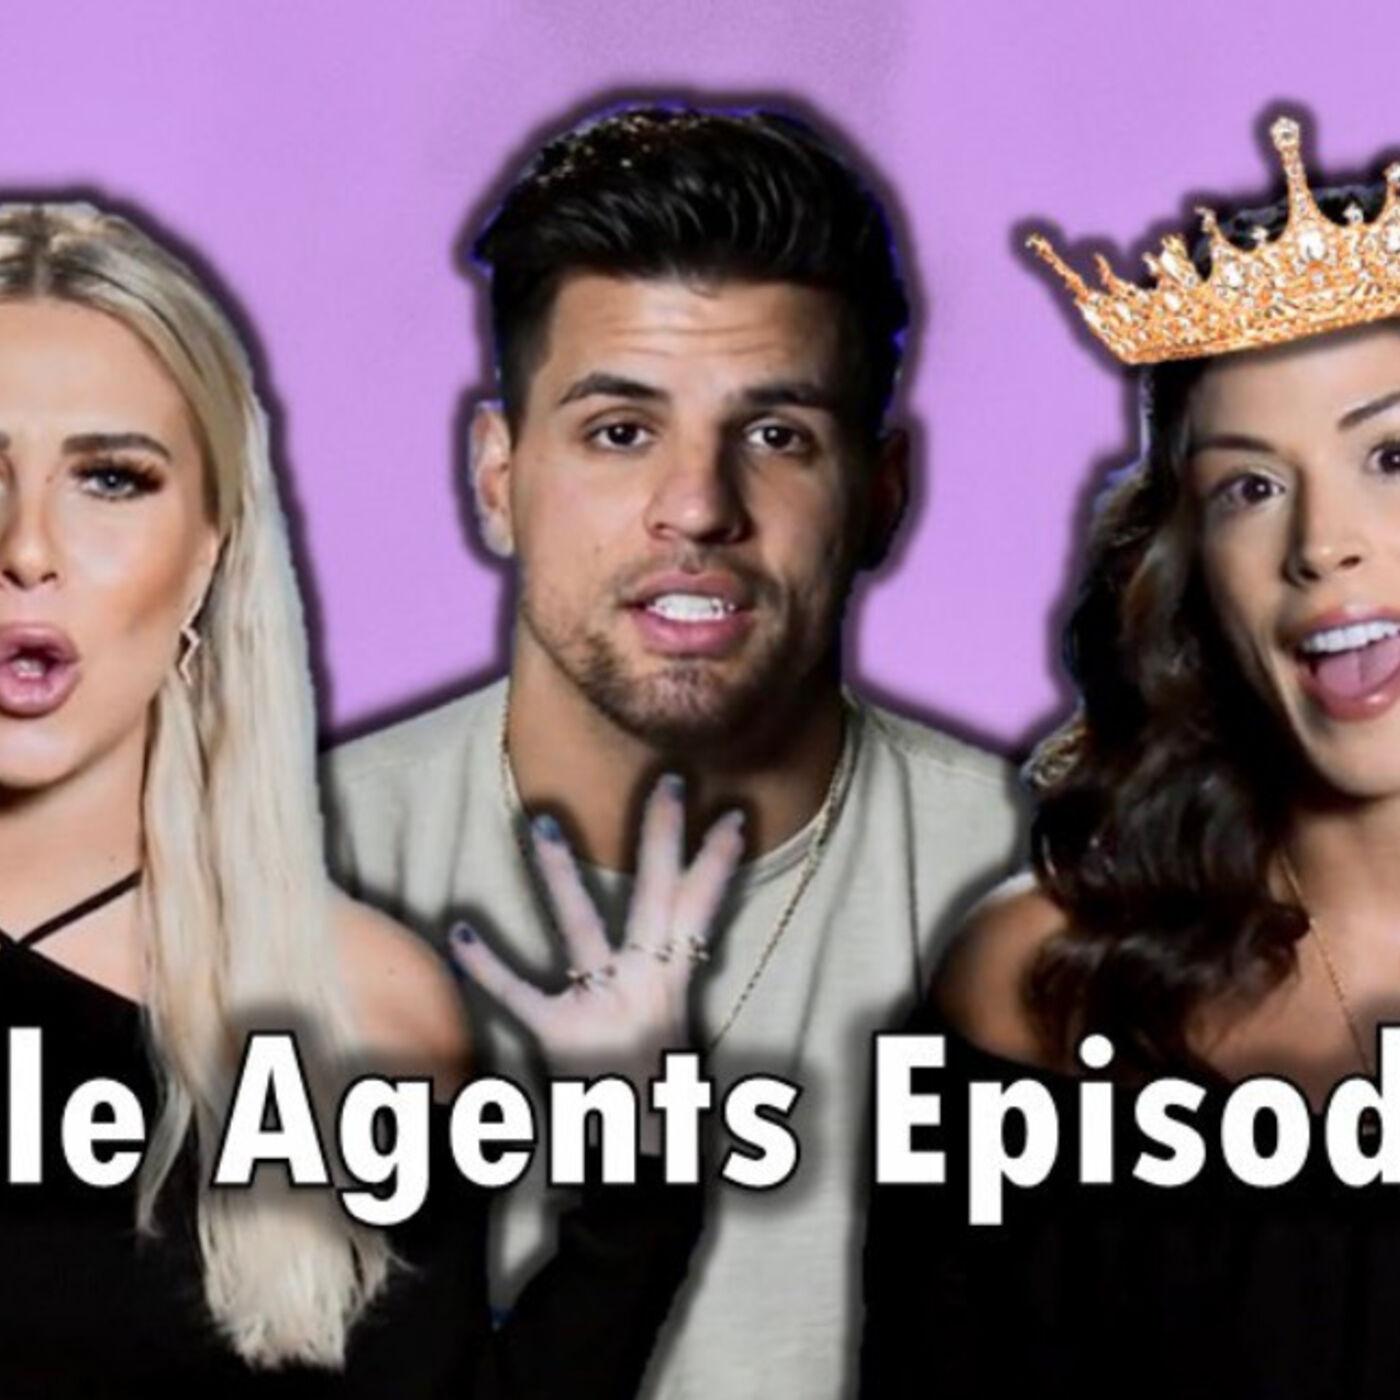 The Challenge Double Agents Episode 13 Recap: The Losing Streak Ends!